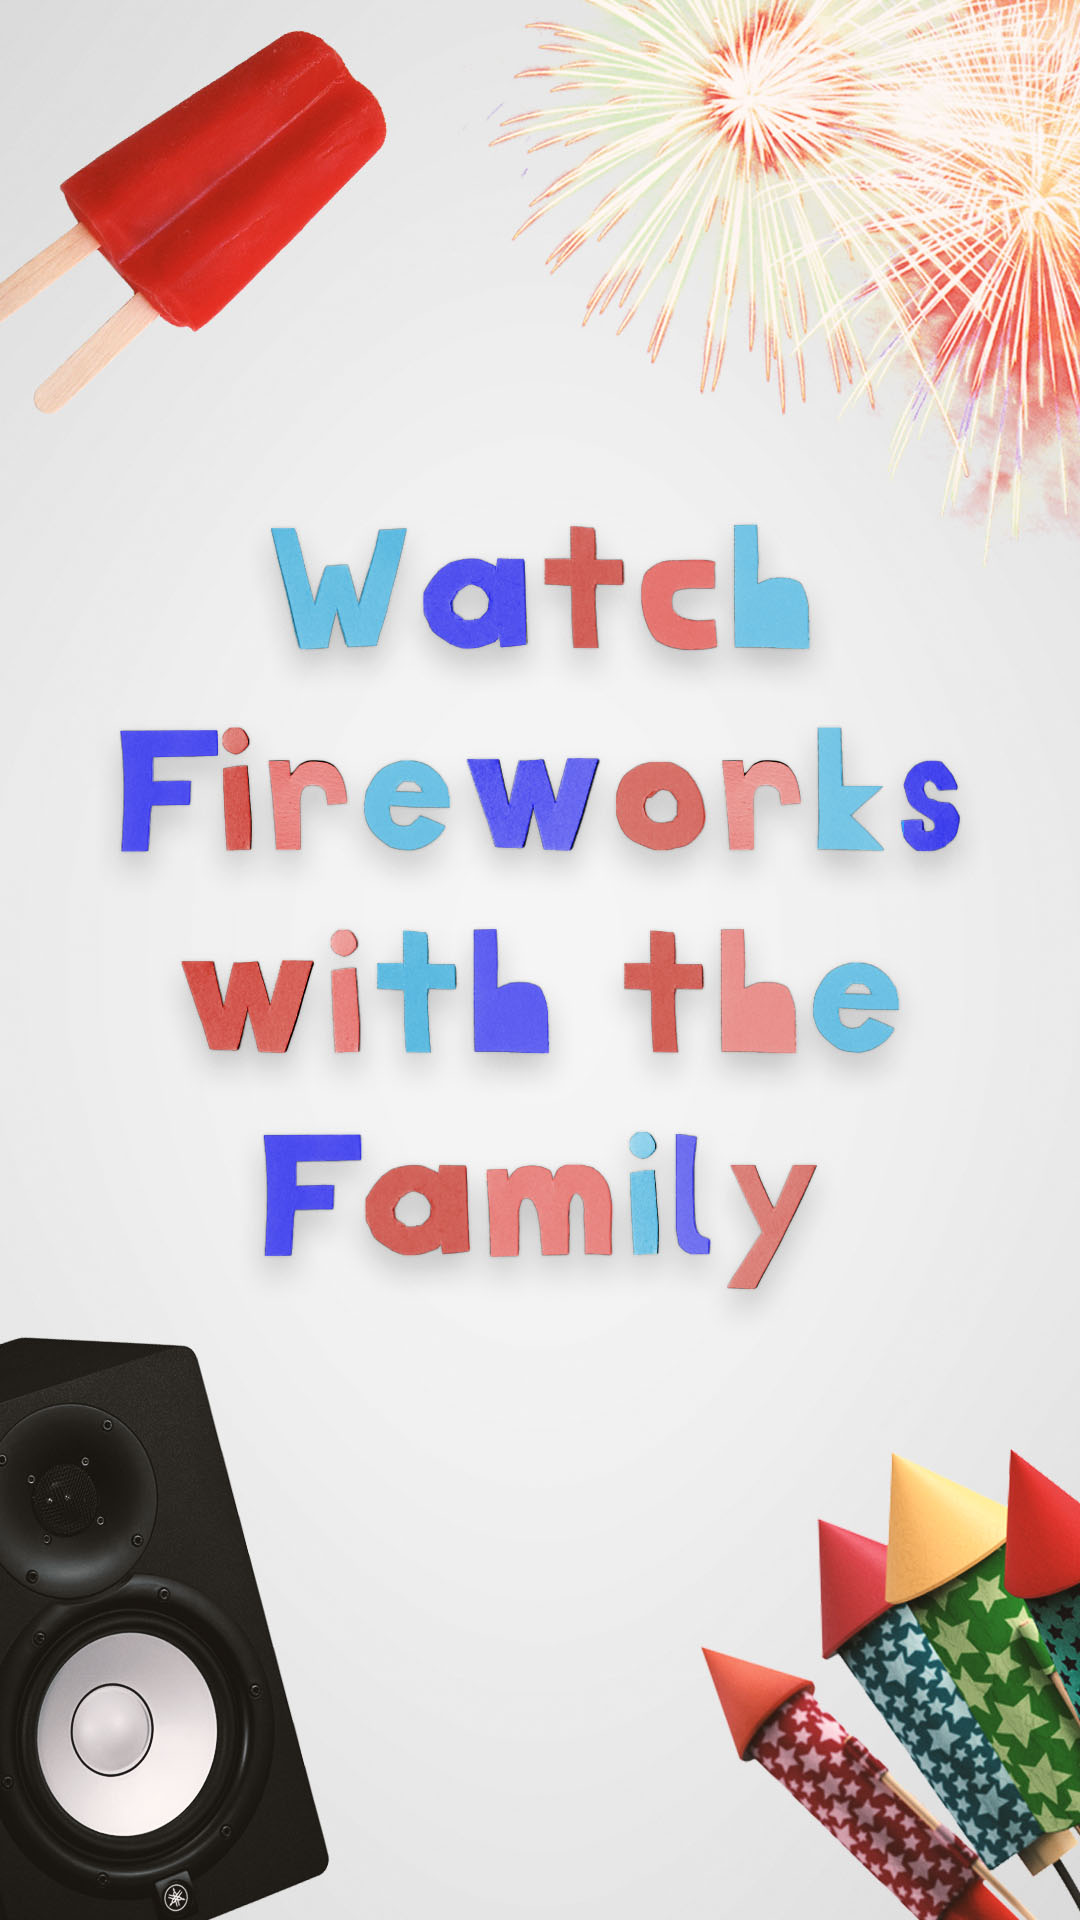 Next Level July 4th Social Media Posts1080x1920 Watch Fireworks